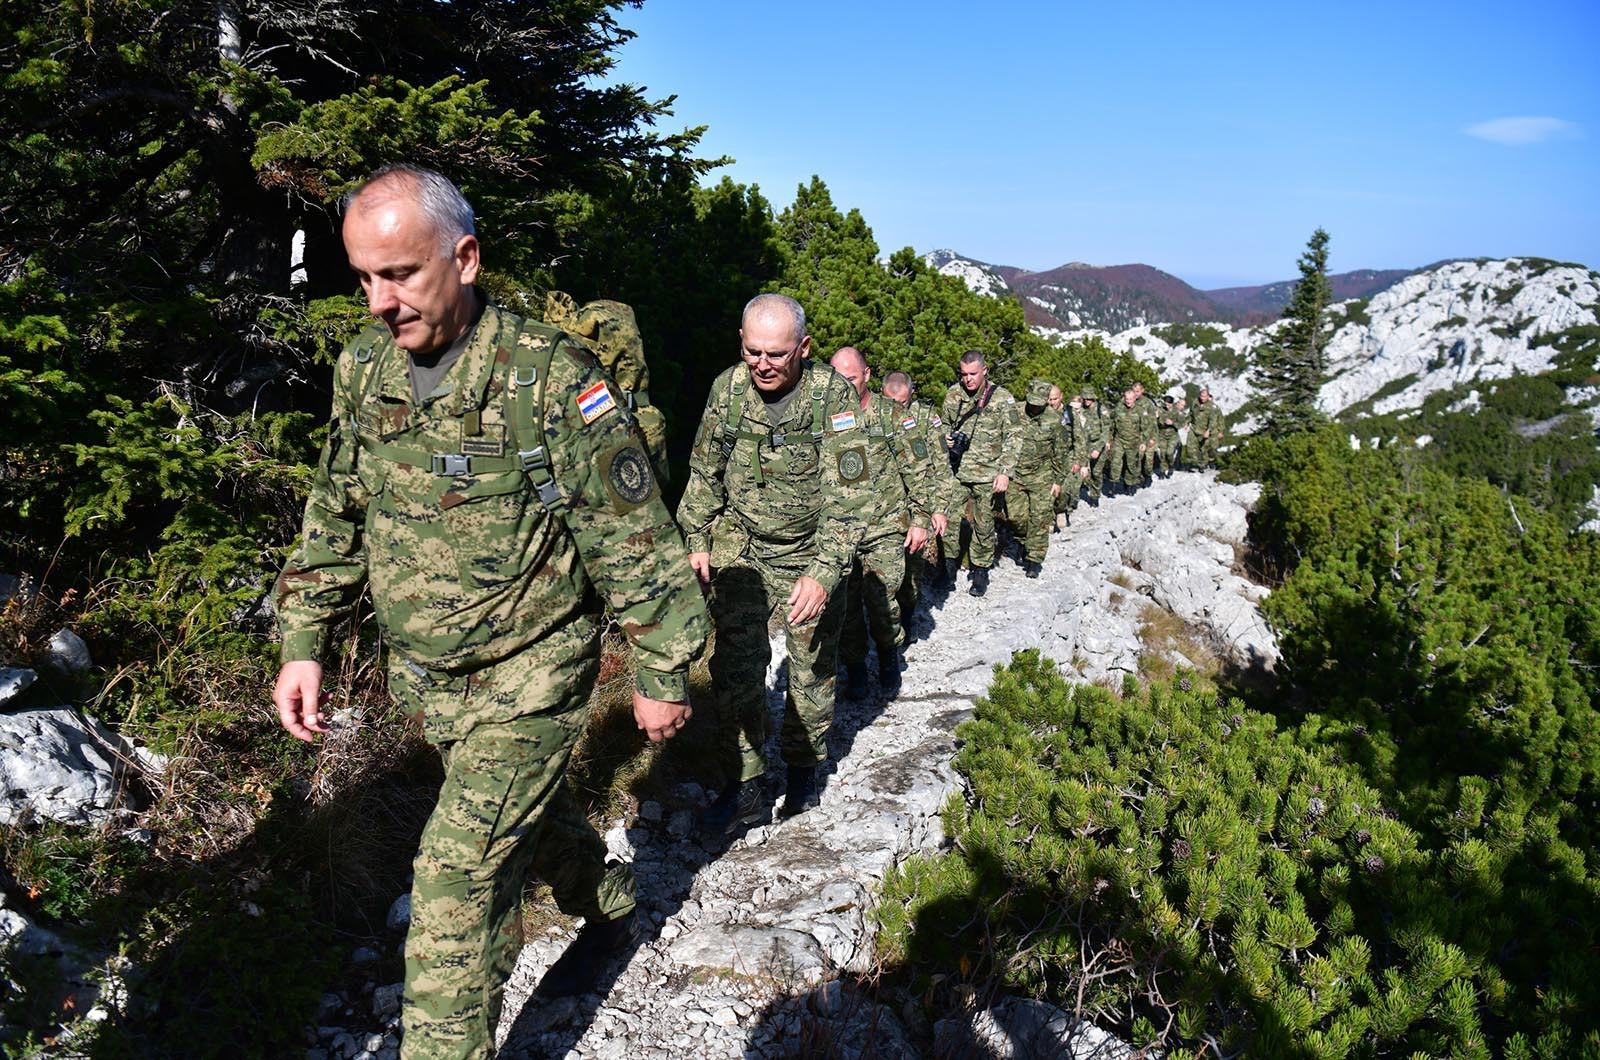 FOTO Hodnja na Velebit dokazala snagu Hrvatske vojske i ojačala timski duh